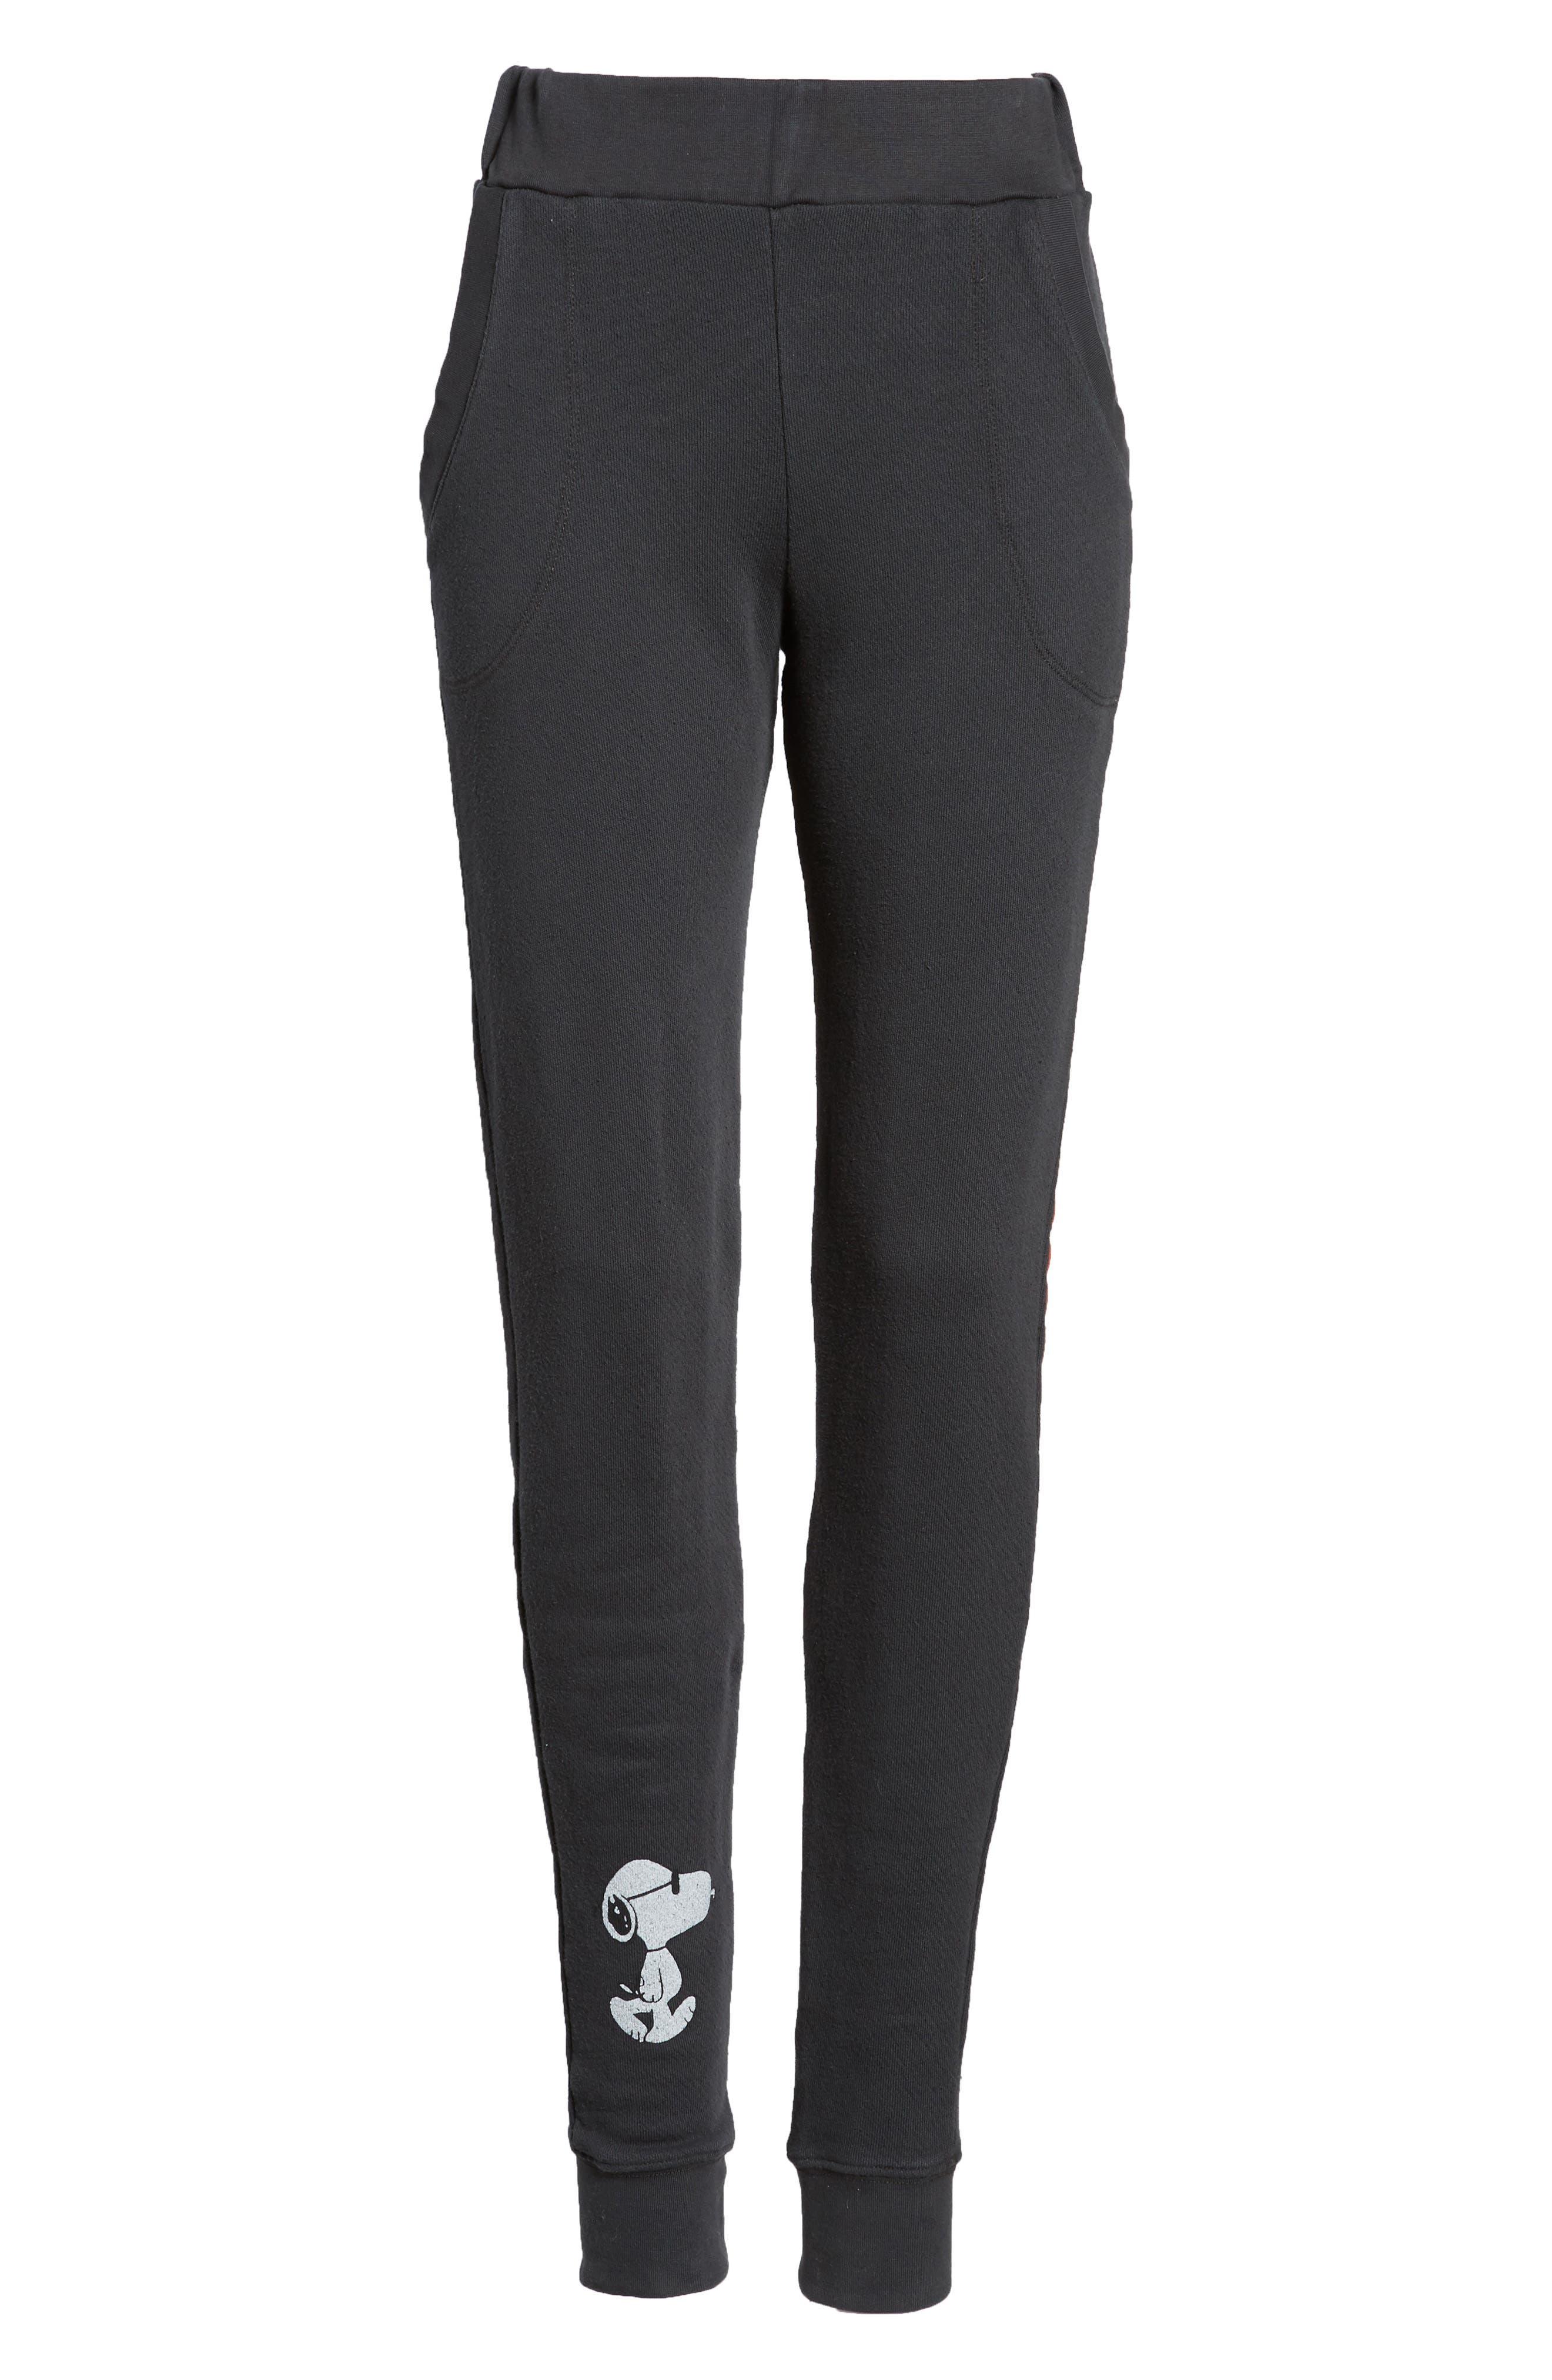 DAYDREAMER Snoopy Sweatpants in Black